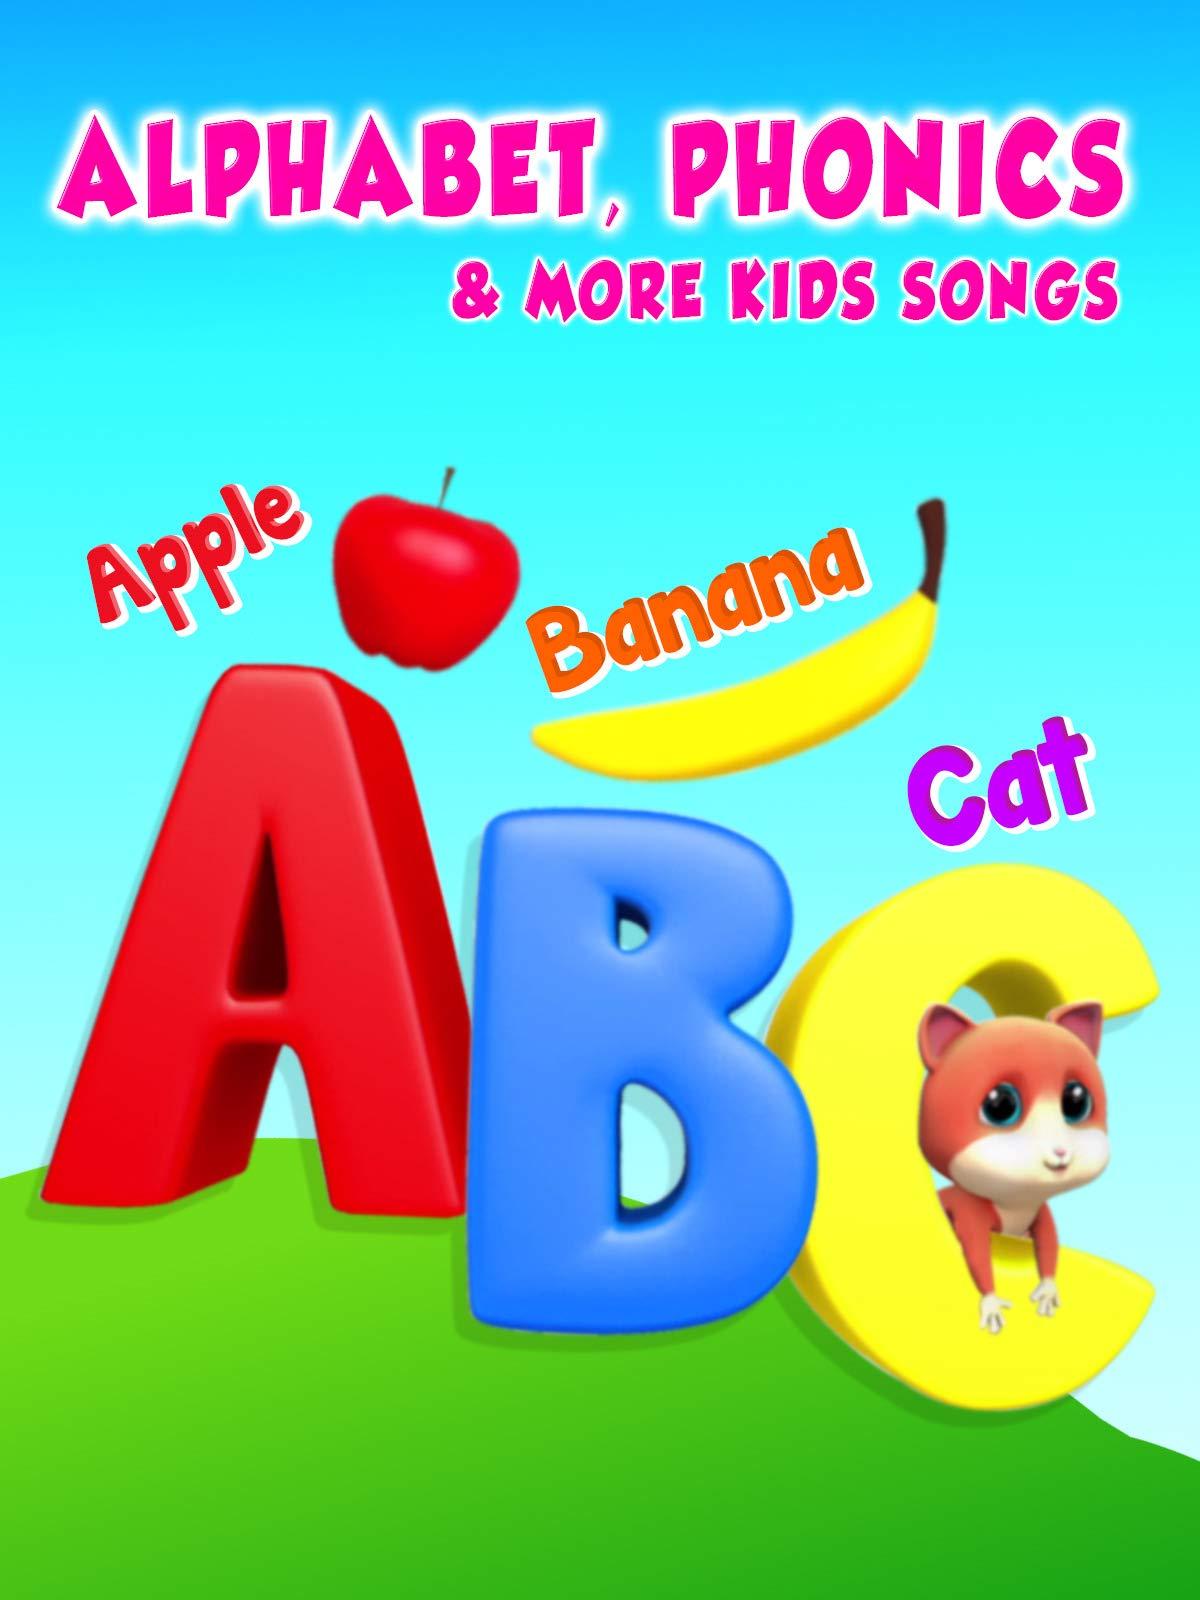 Alphabet, Phonics, & More Kids Songs on Amazon Prime Video UK